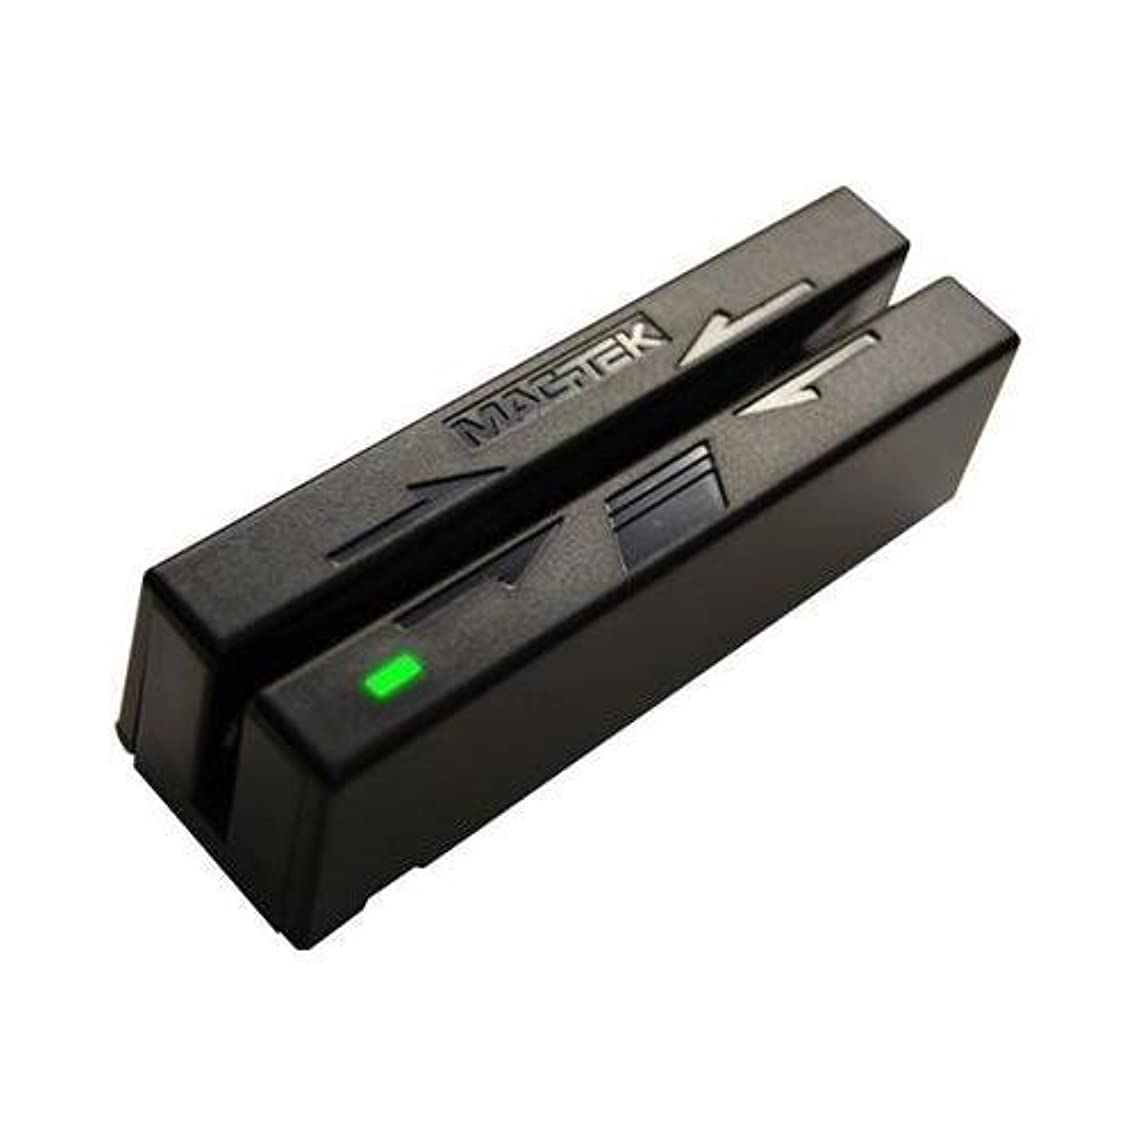 MagTek 21040140 USB Mini Swipe Magnetic Strip Credit Card Reader, Triple Track